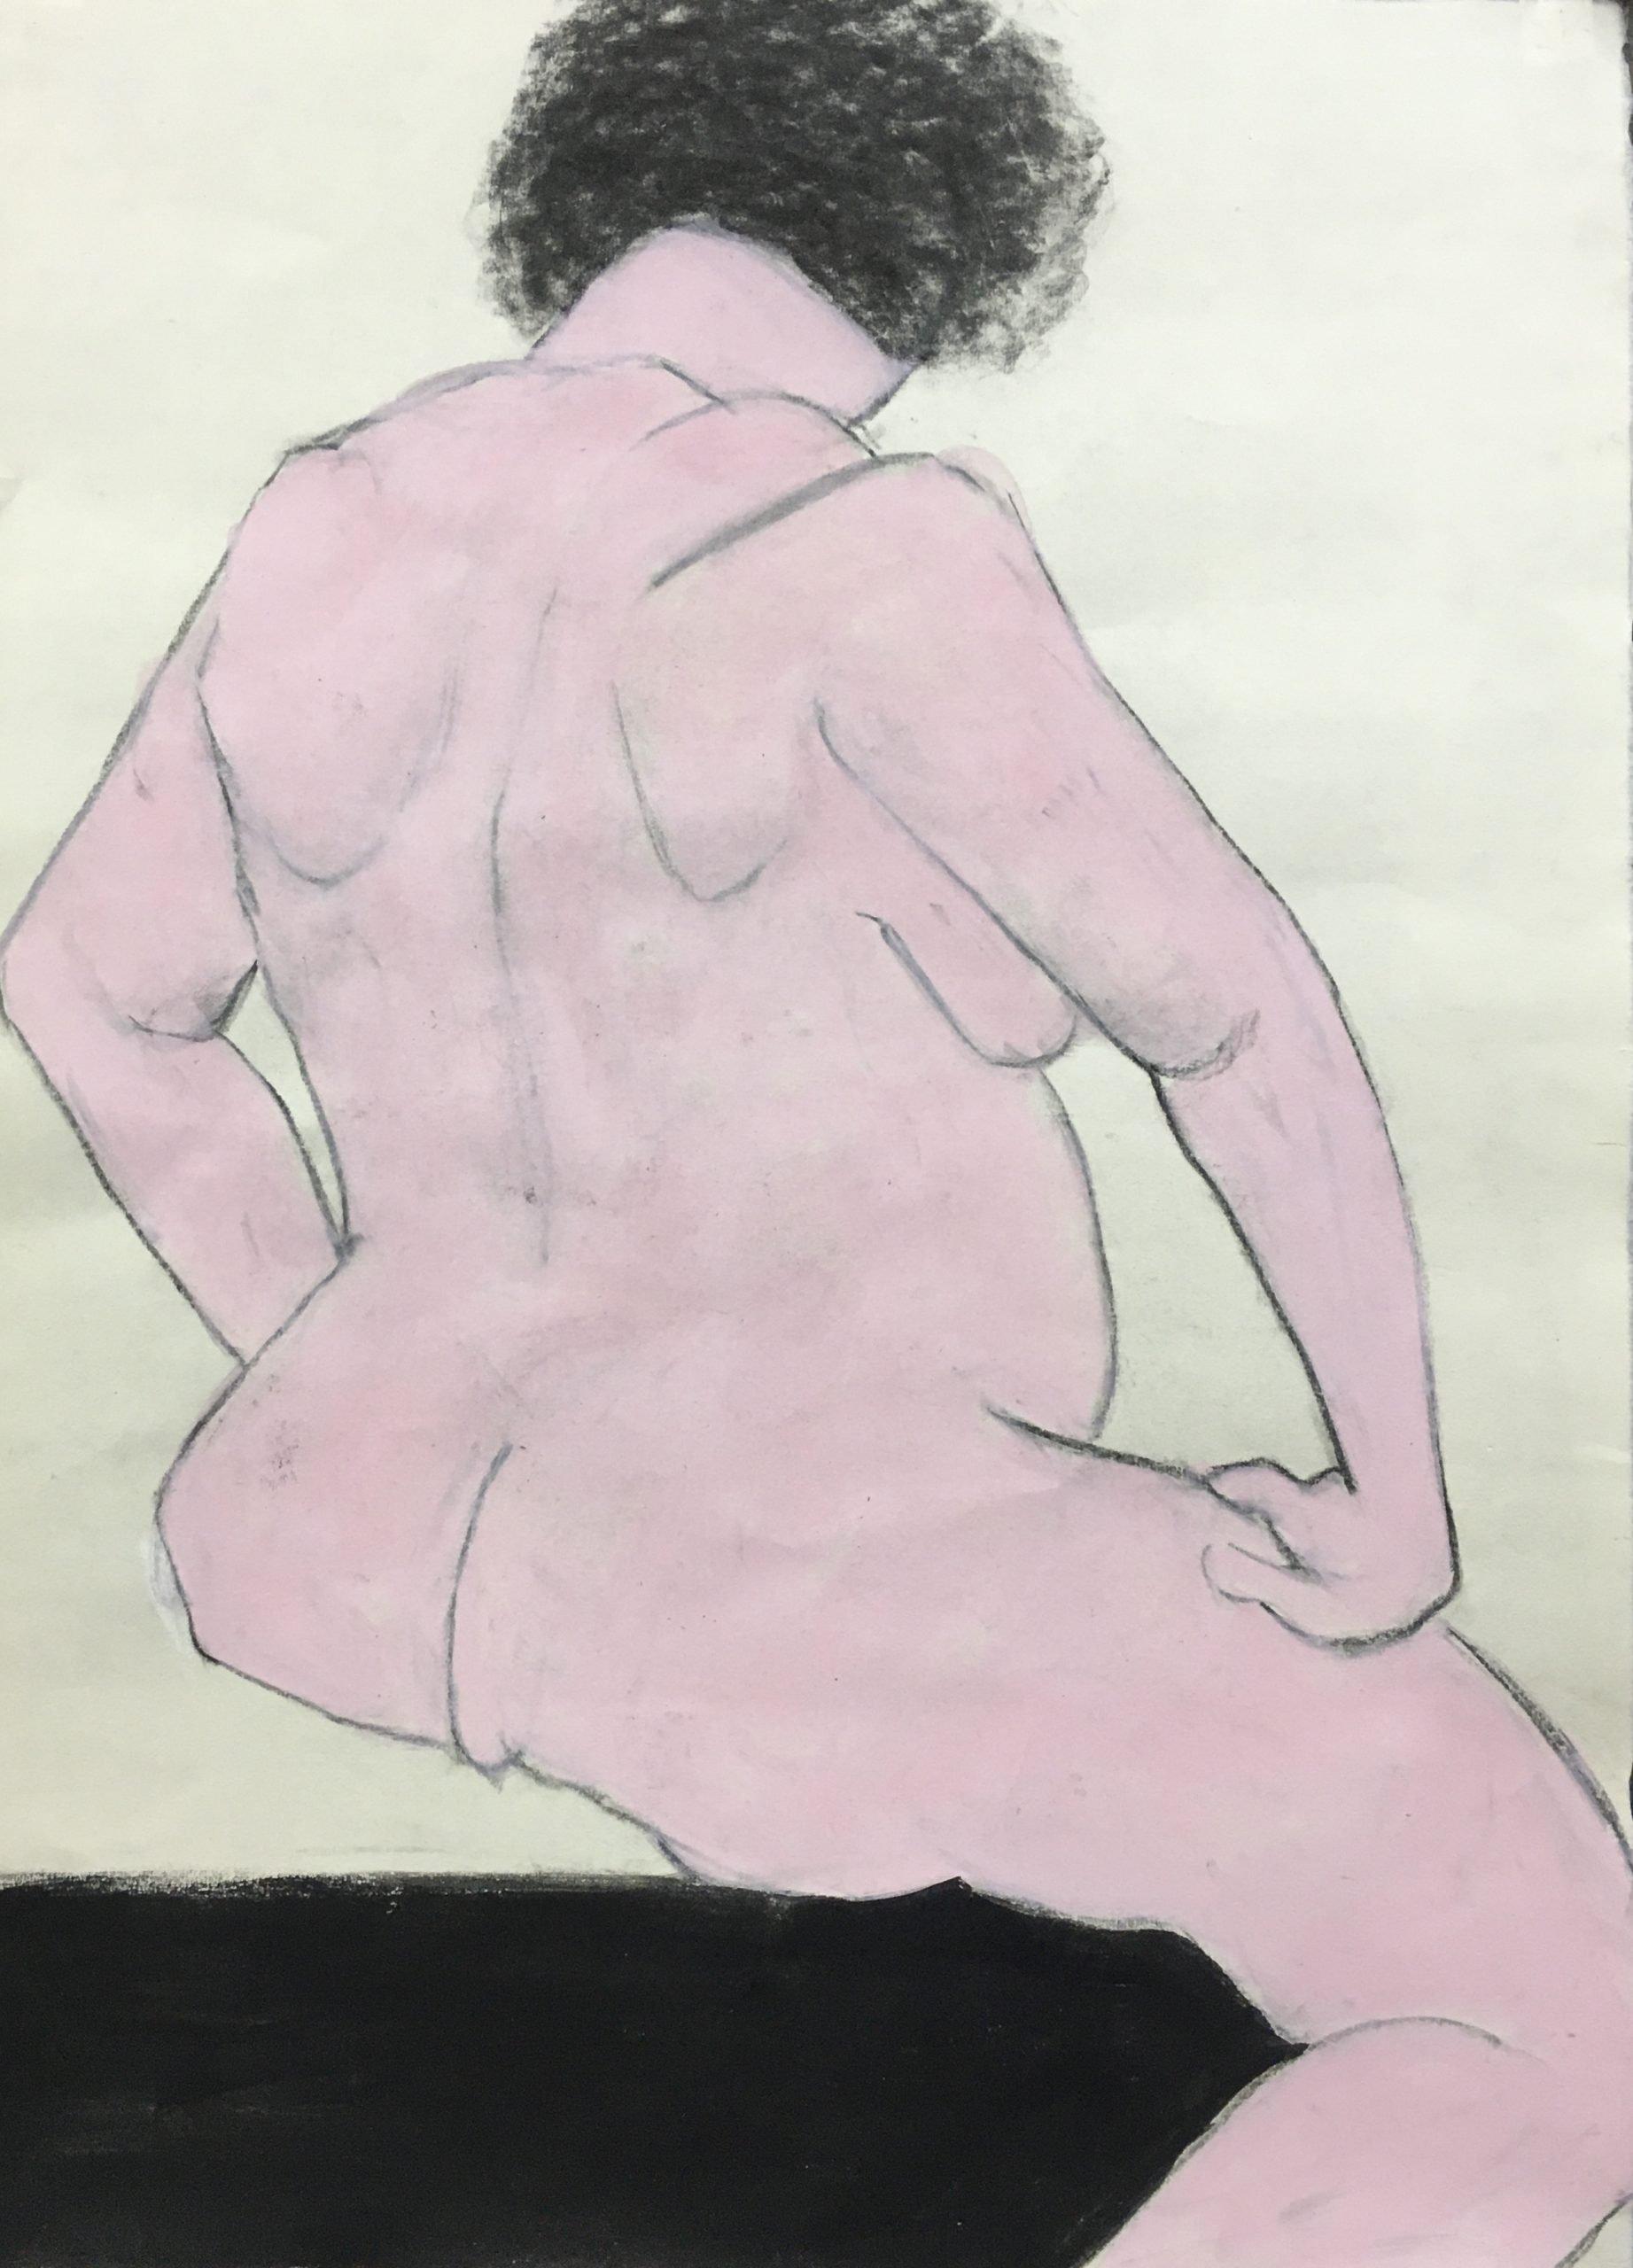 Jan Corash, Sitting in pink & black, Waltham open studios 2021